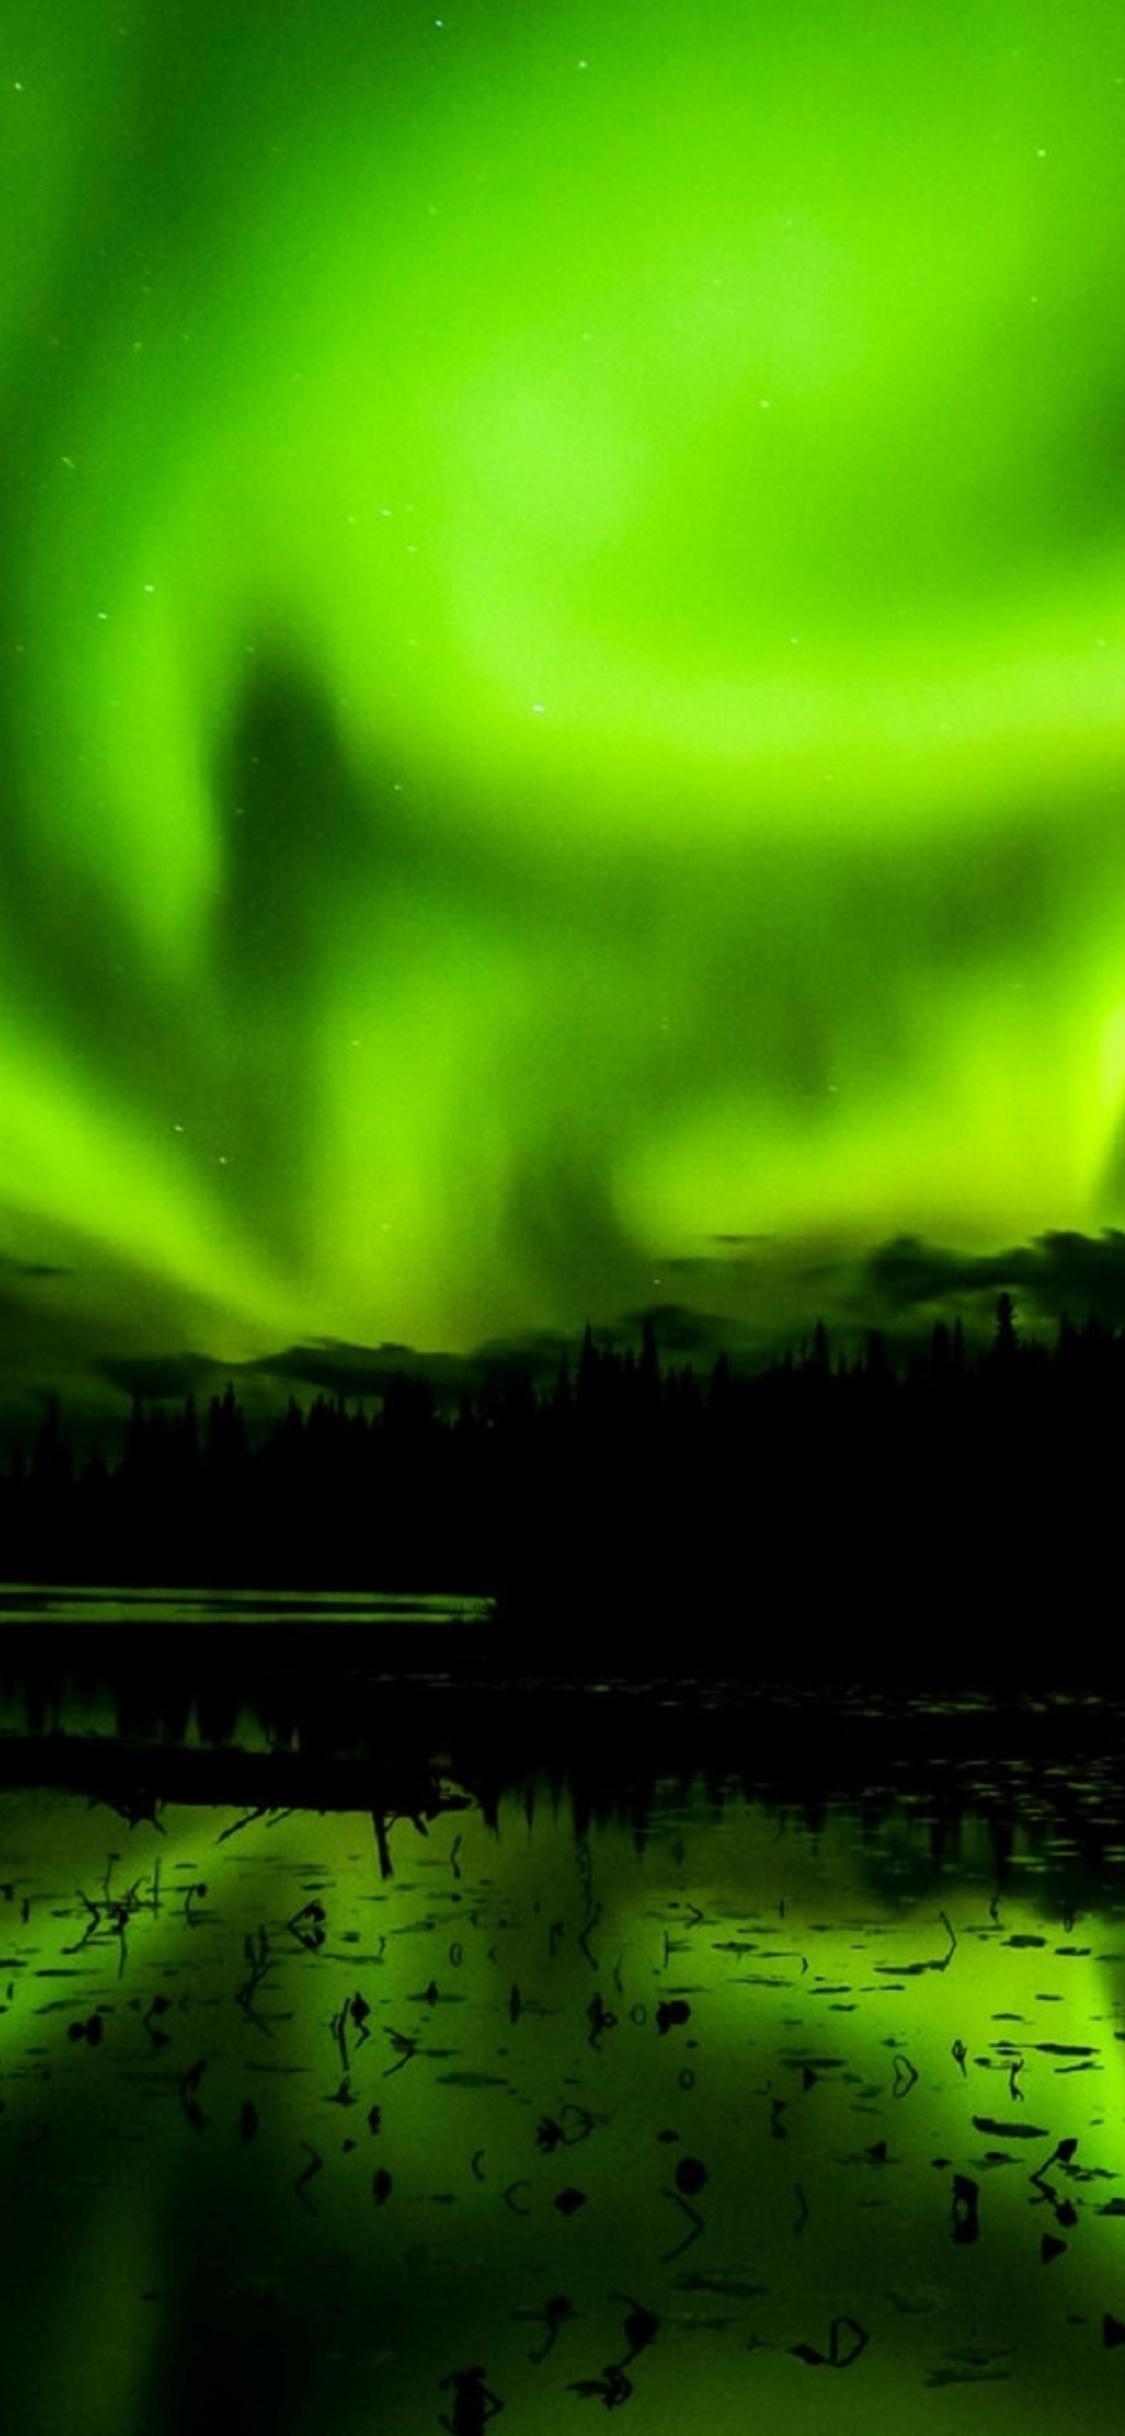 Aurora Borealis Wallpaper Quality HD Desktop Backgrounds